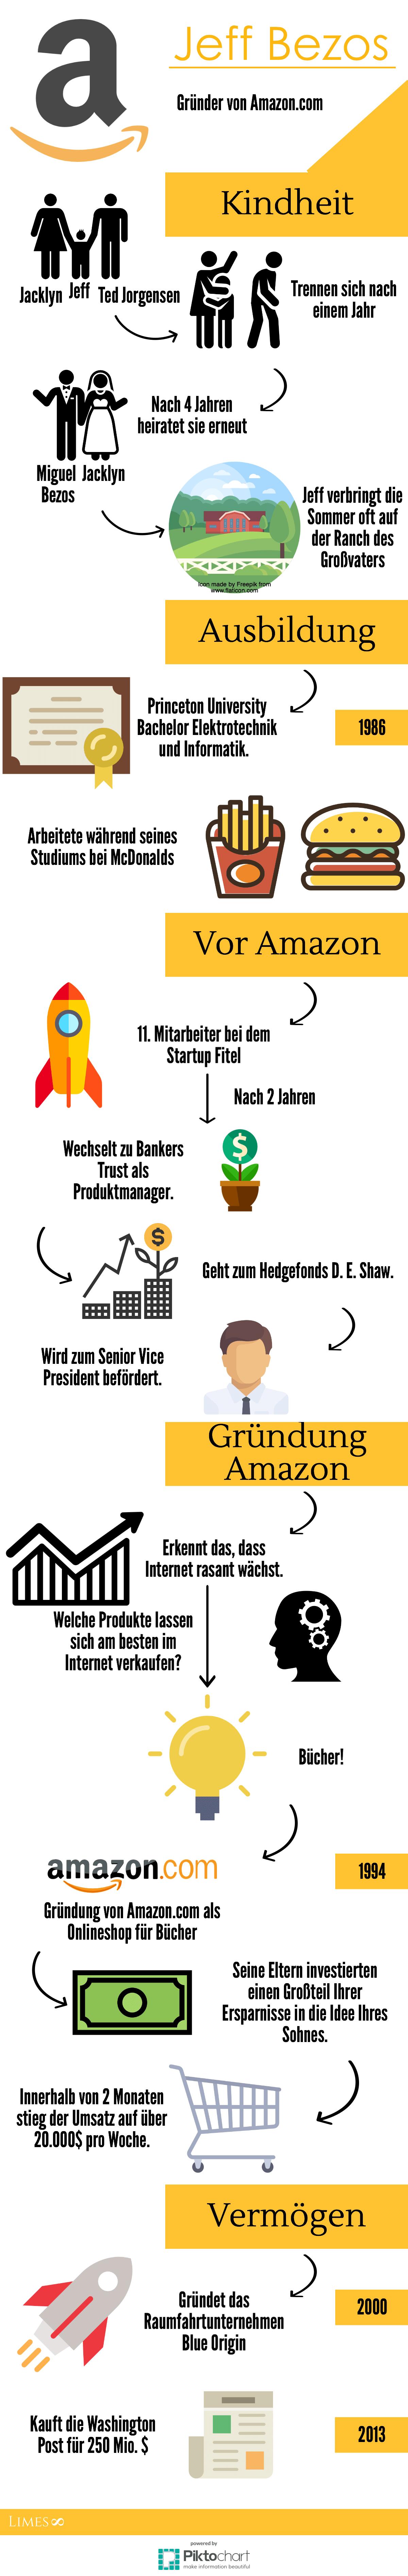 Infografik Gründer von Amazon - Jeff Bezos